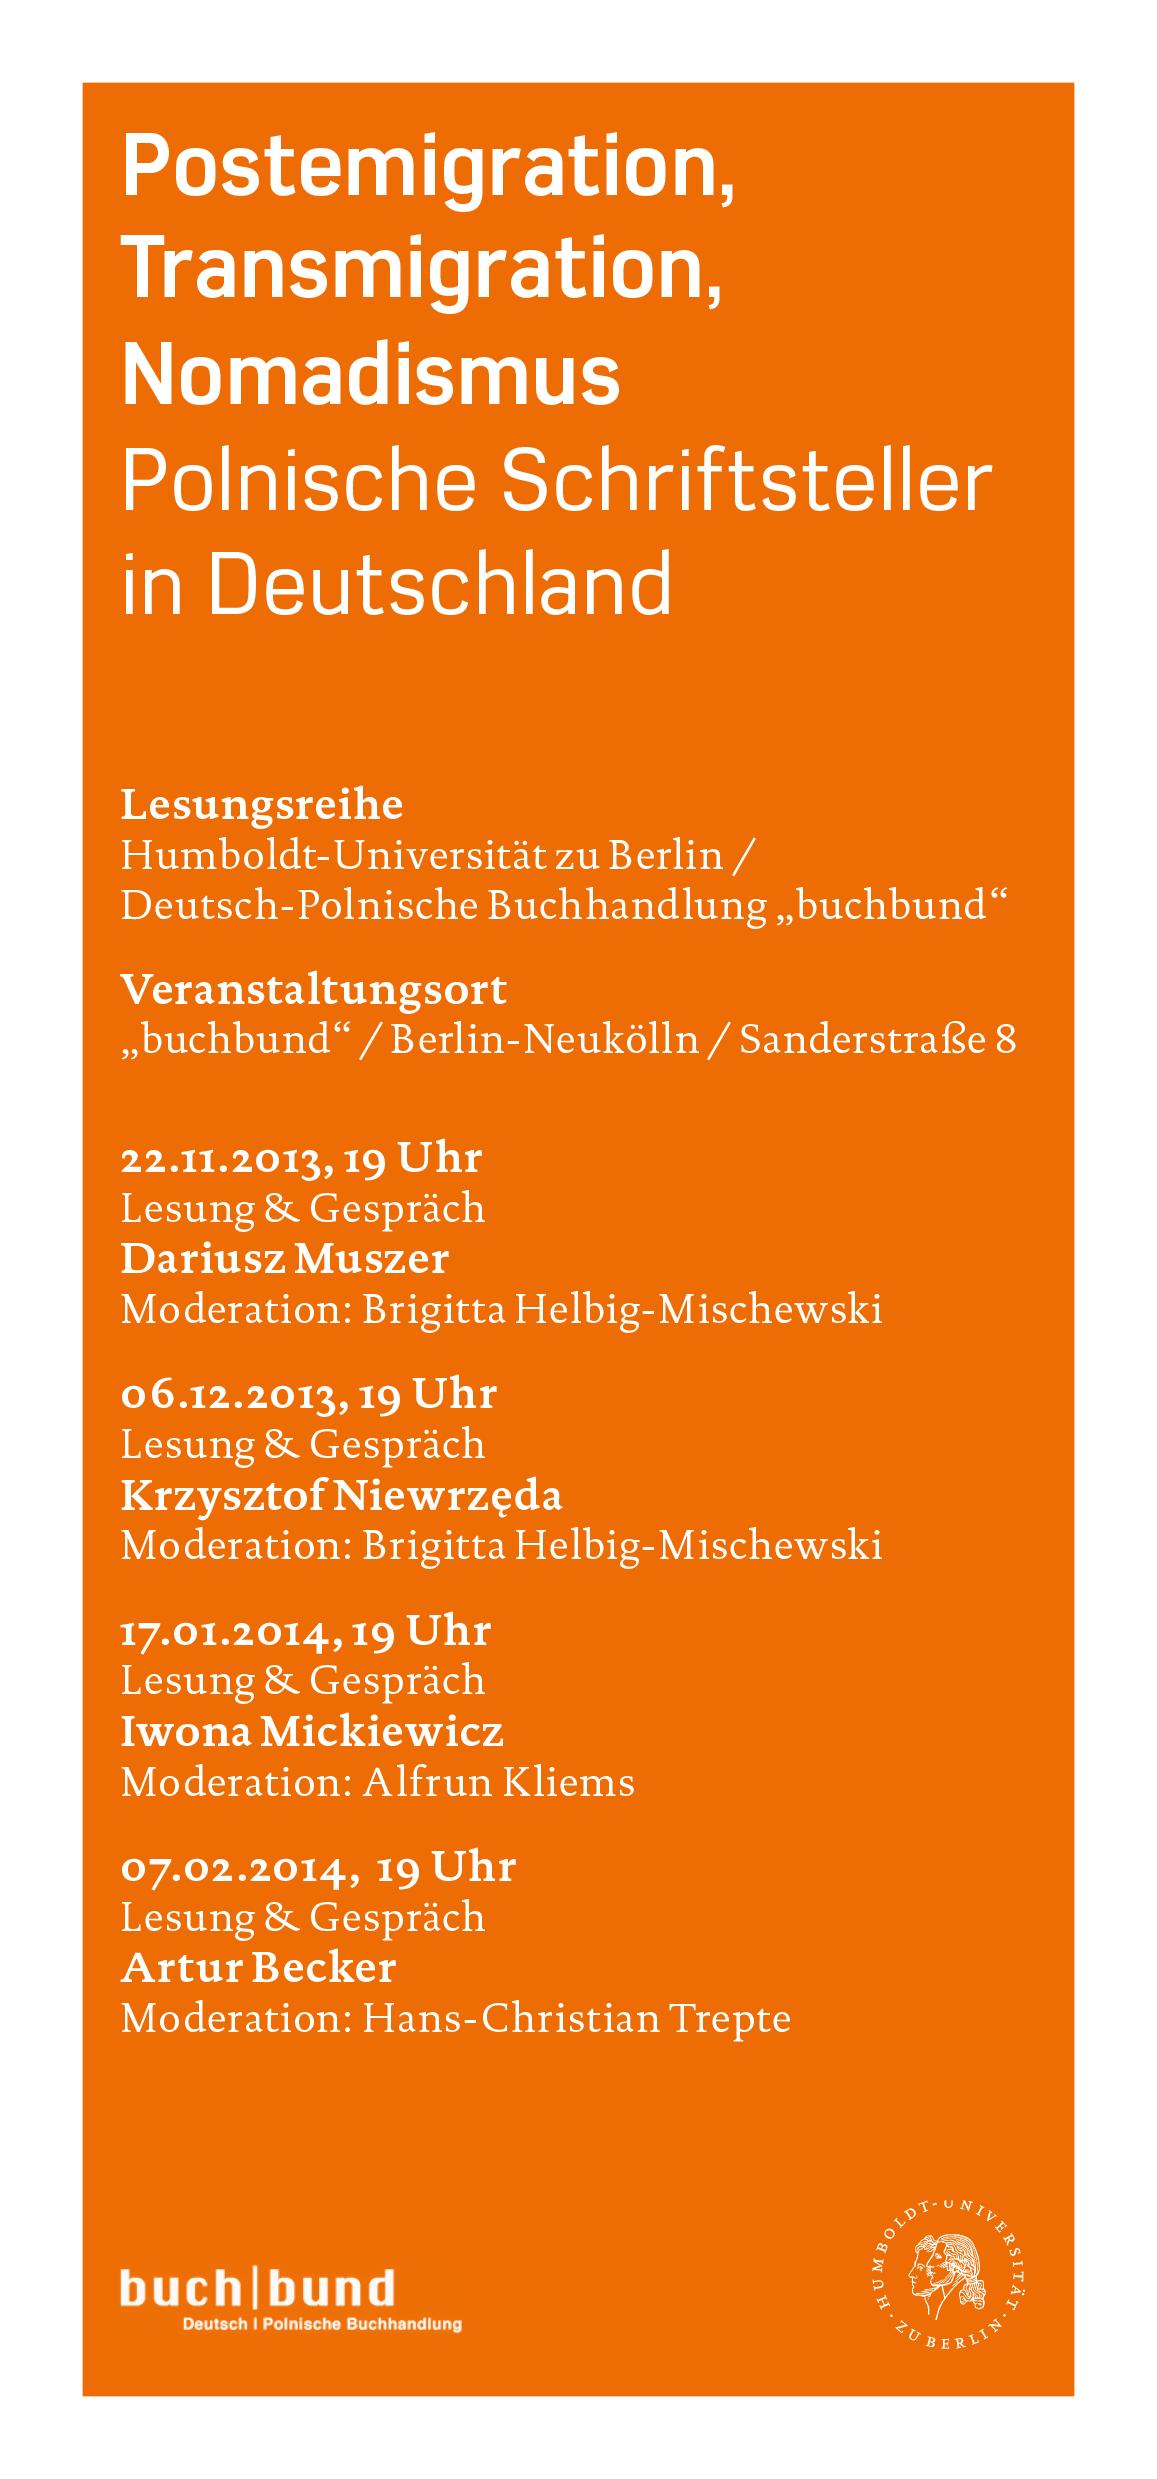 Lesungsreihe_buchbund